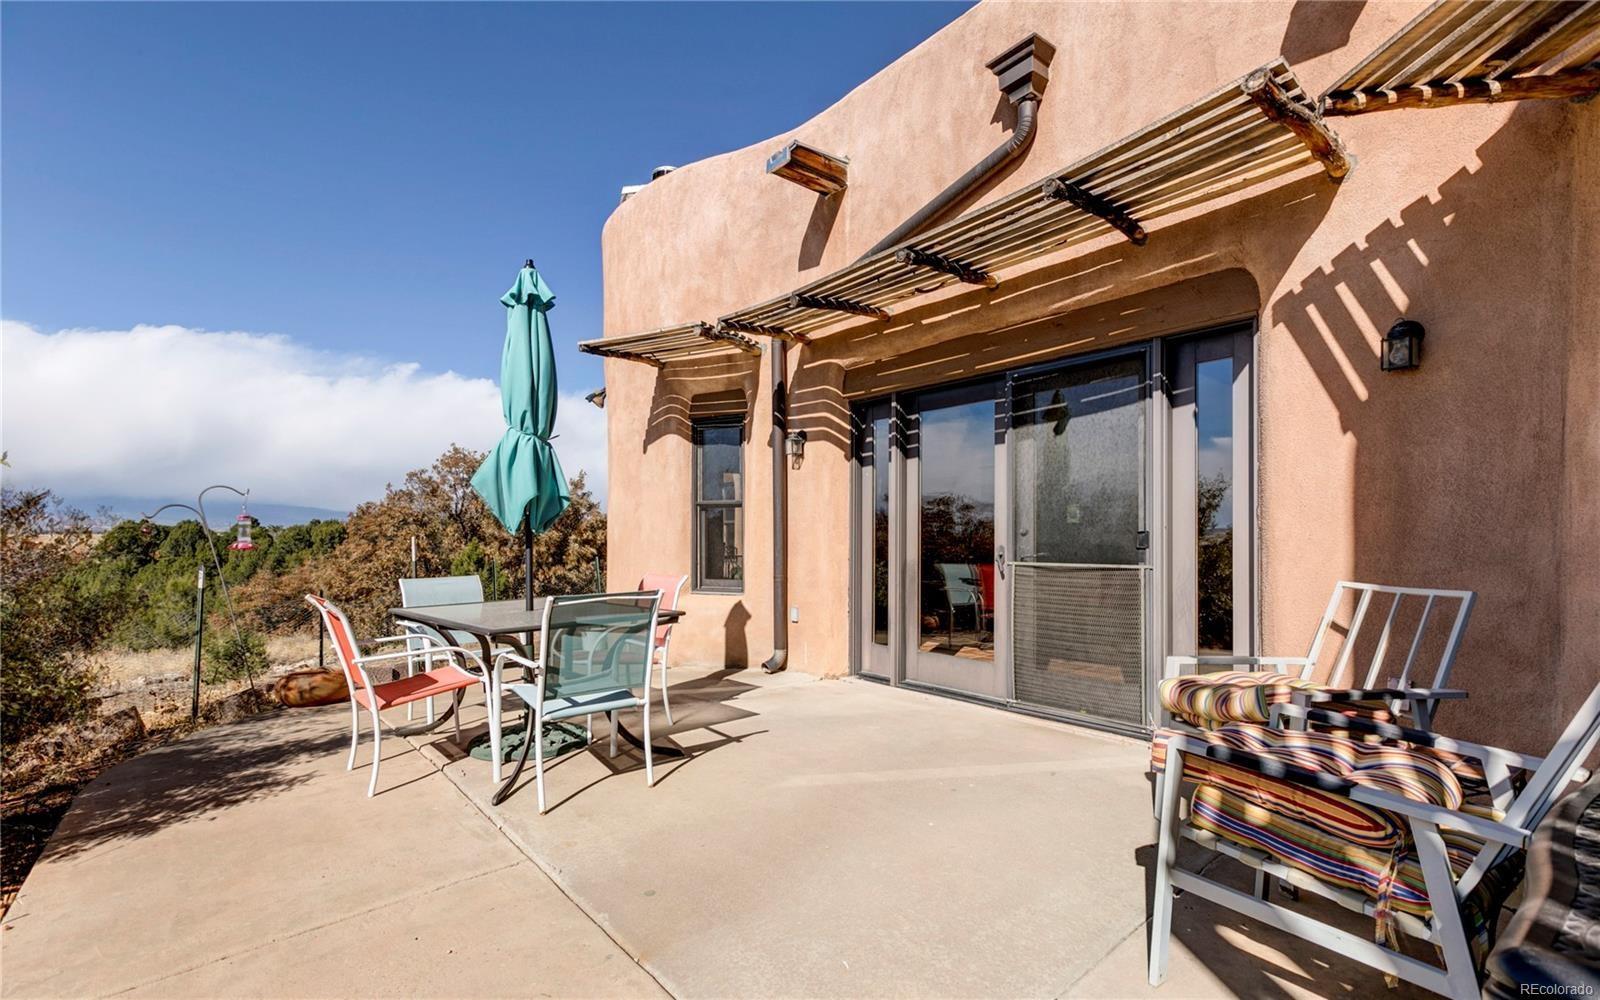 MLS# 3090448 - 32 - 7708 Sunset Ridge Drive, Pueblo, CO 81004